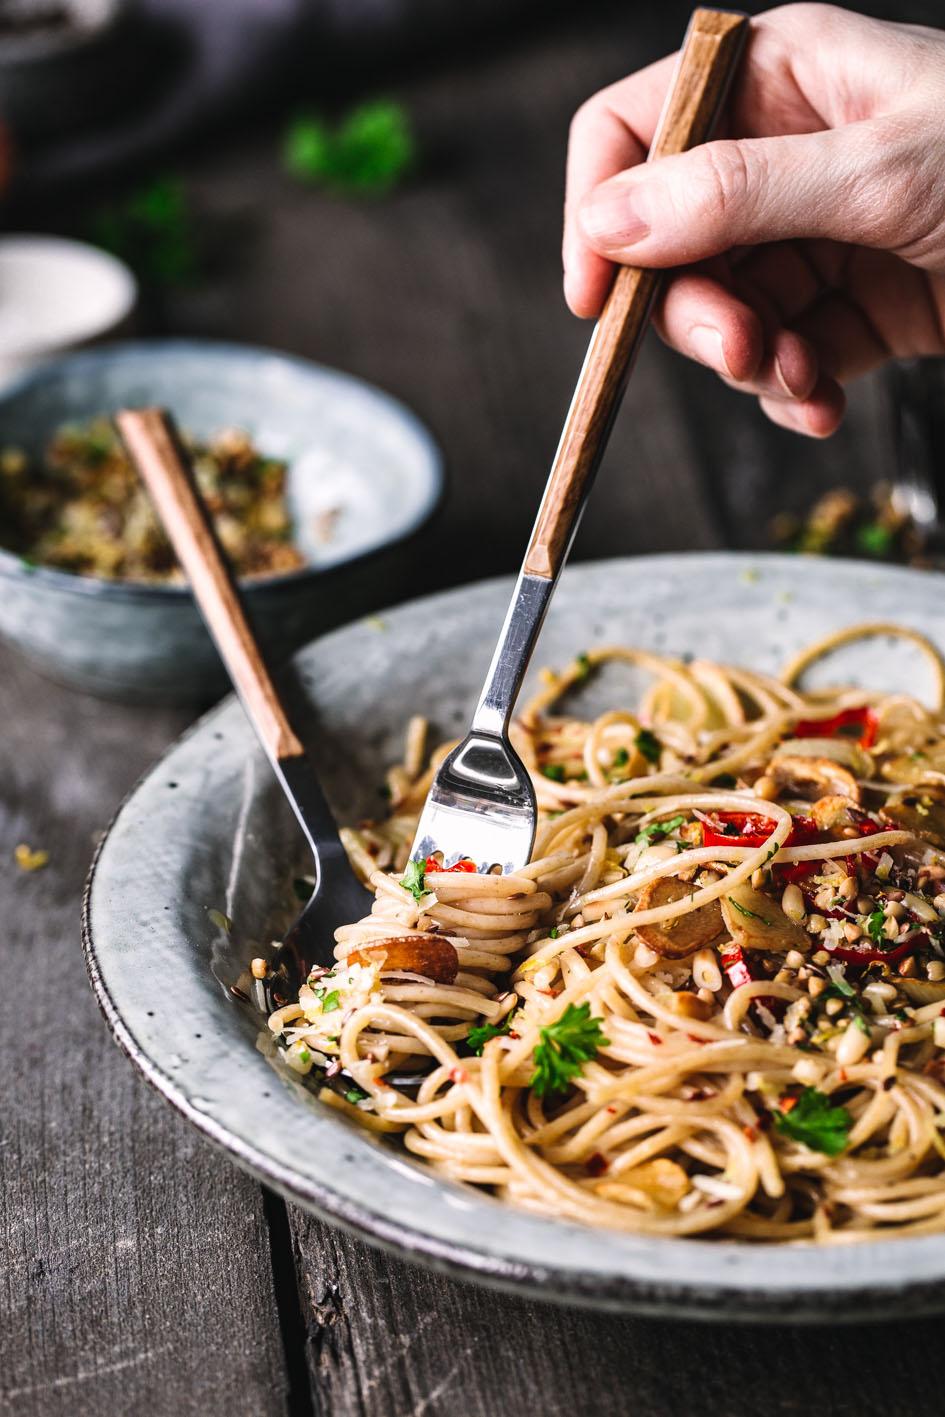 Quinoa Spaghetti Alio Olio mit viel Knoblauch und Öl